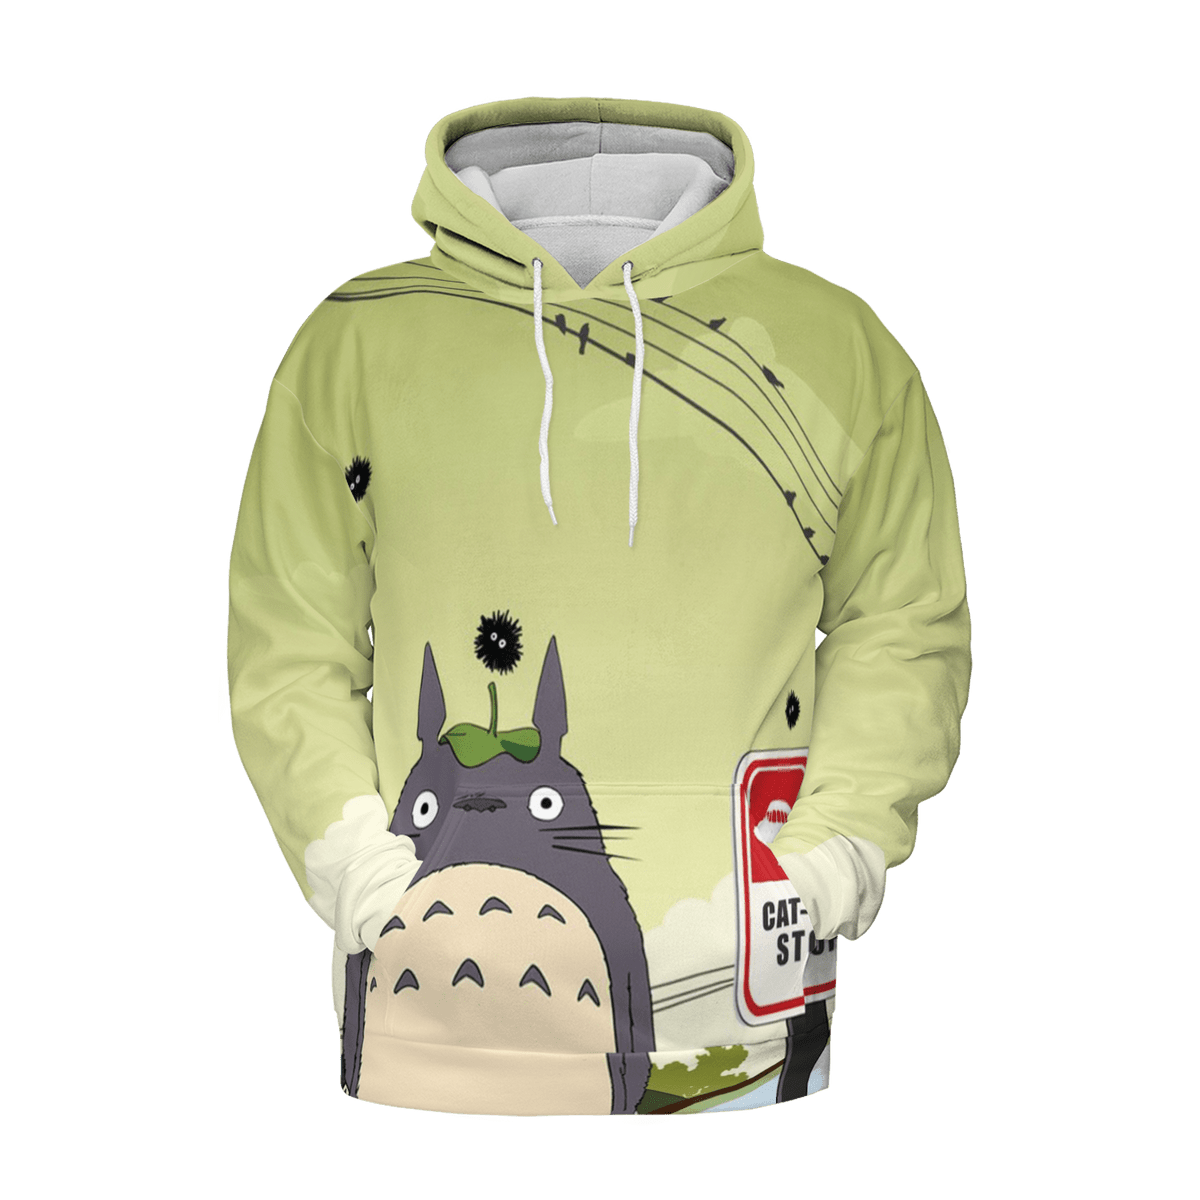 Totoro at the Cat Bus Stop 3D Hoodie